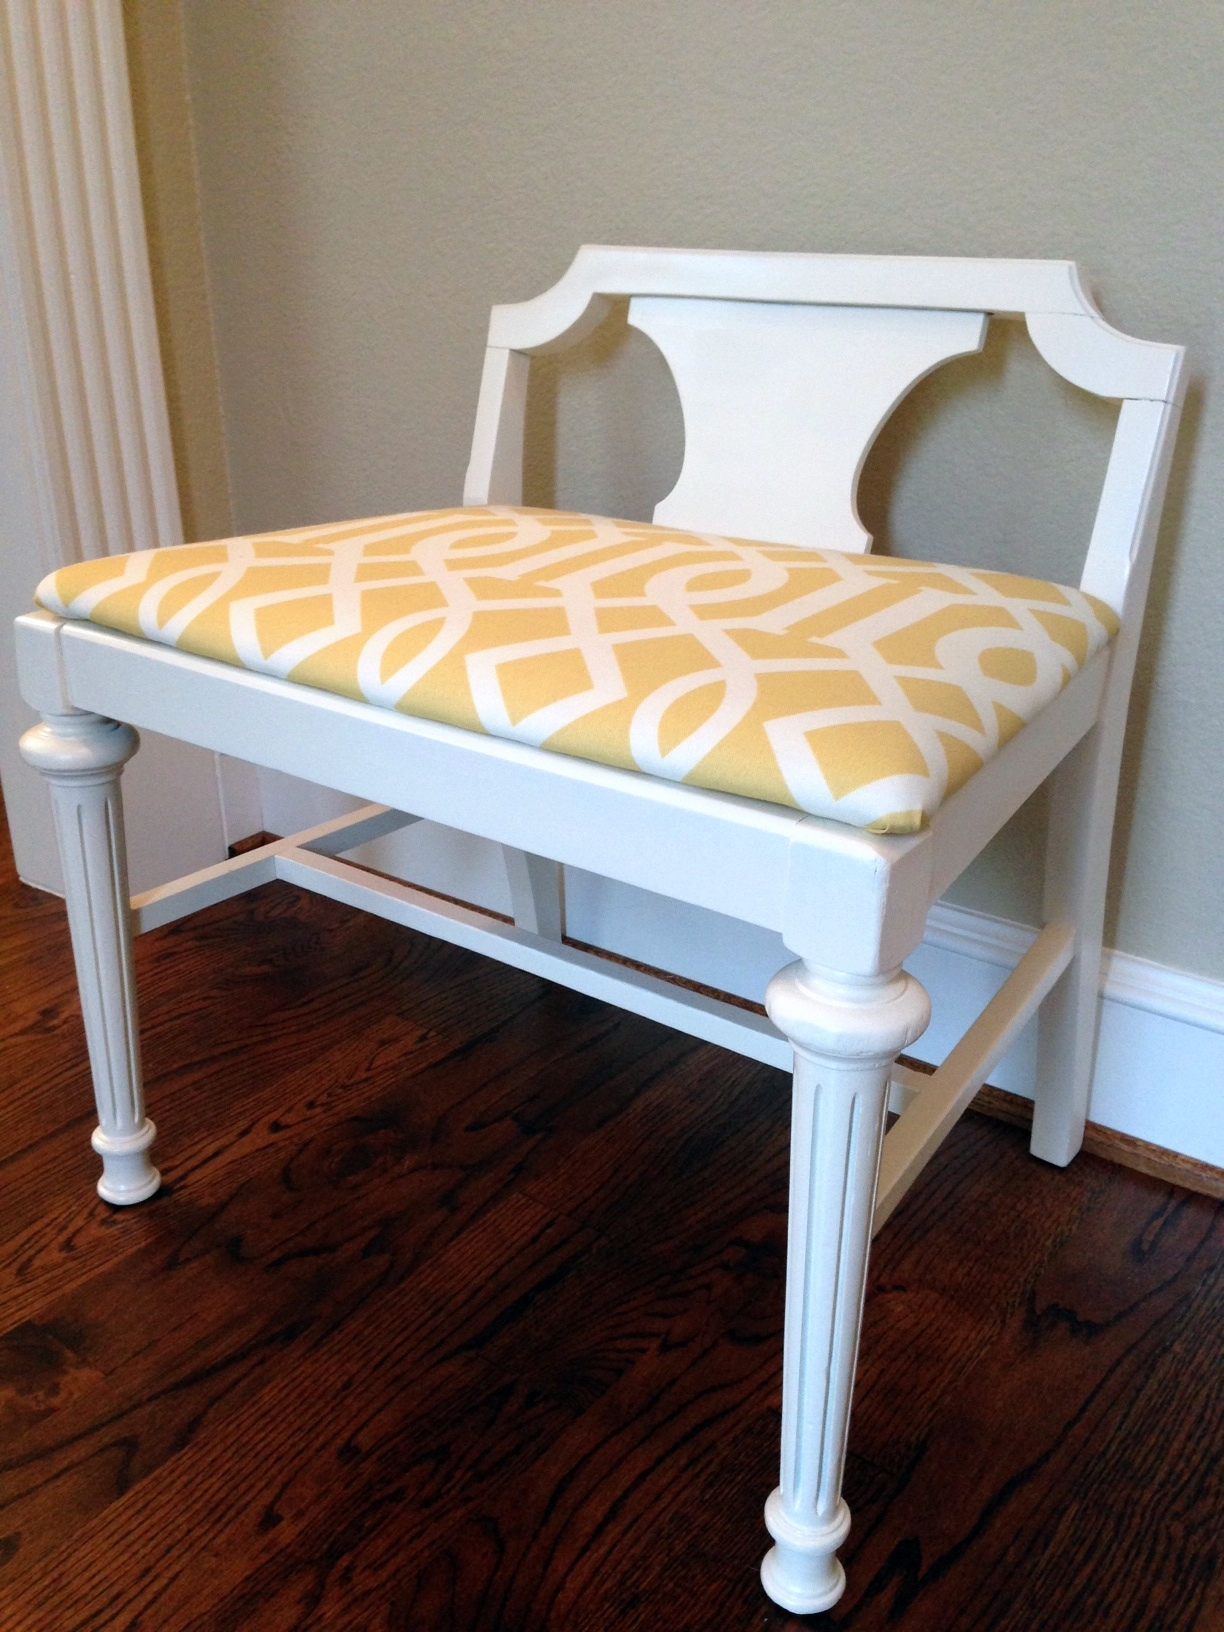 More Designs Of Vanity Bench Seat For Bedroom Vanity